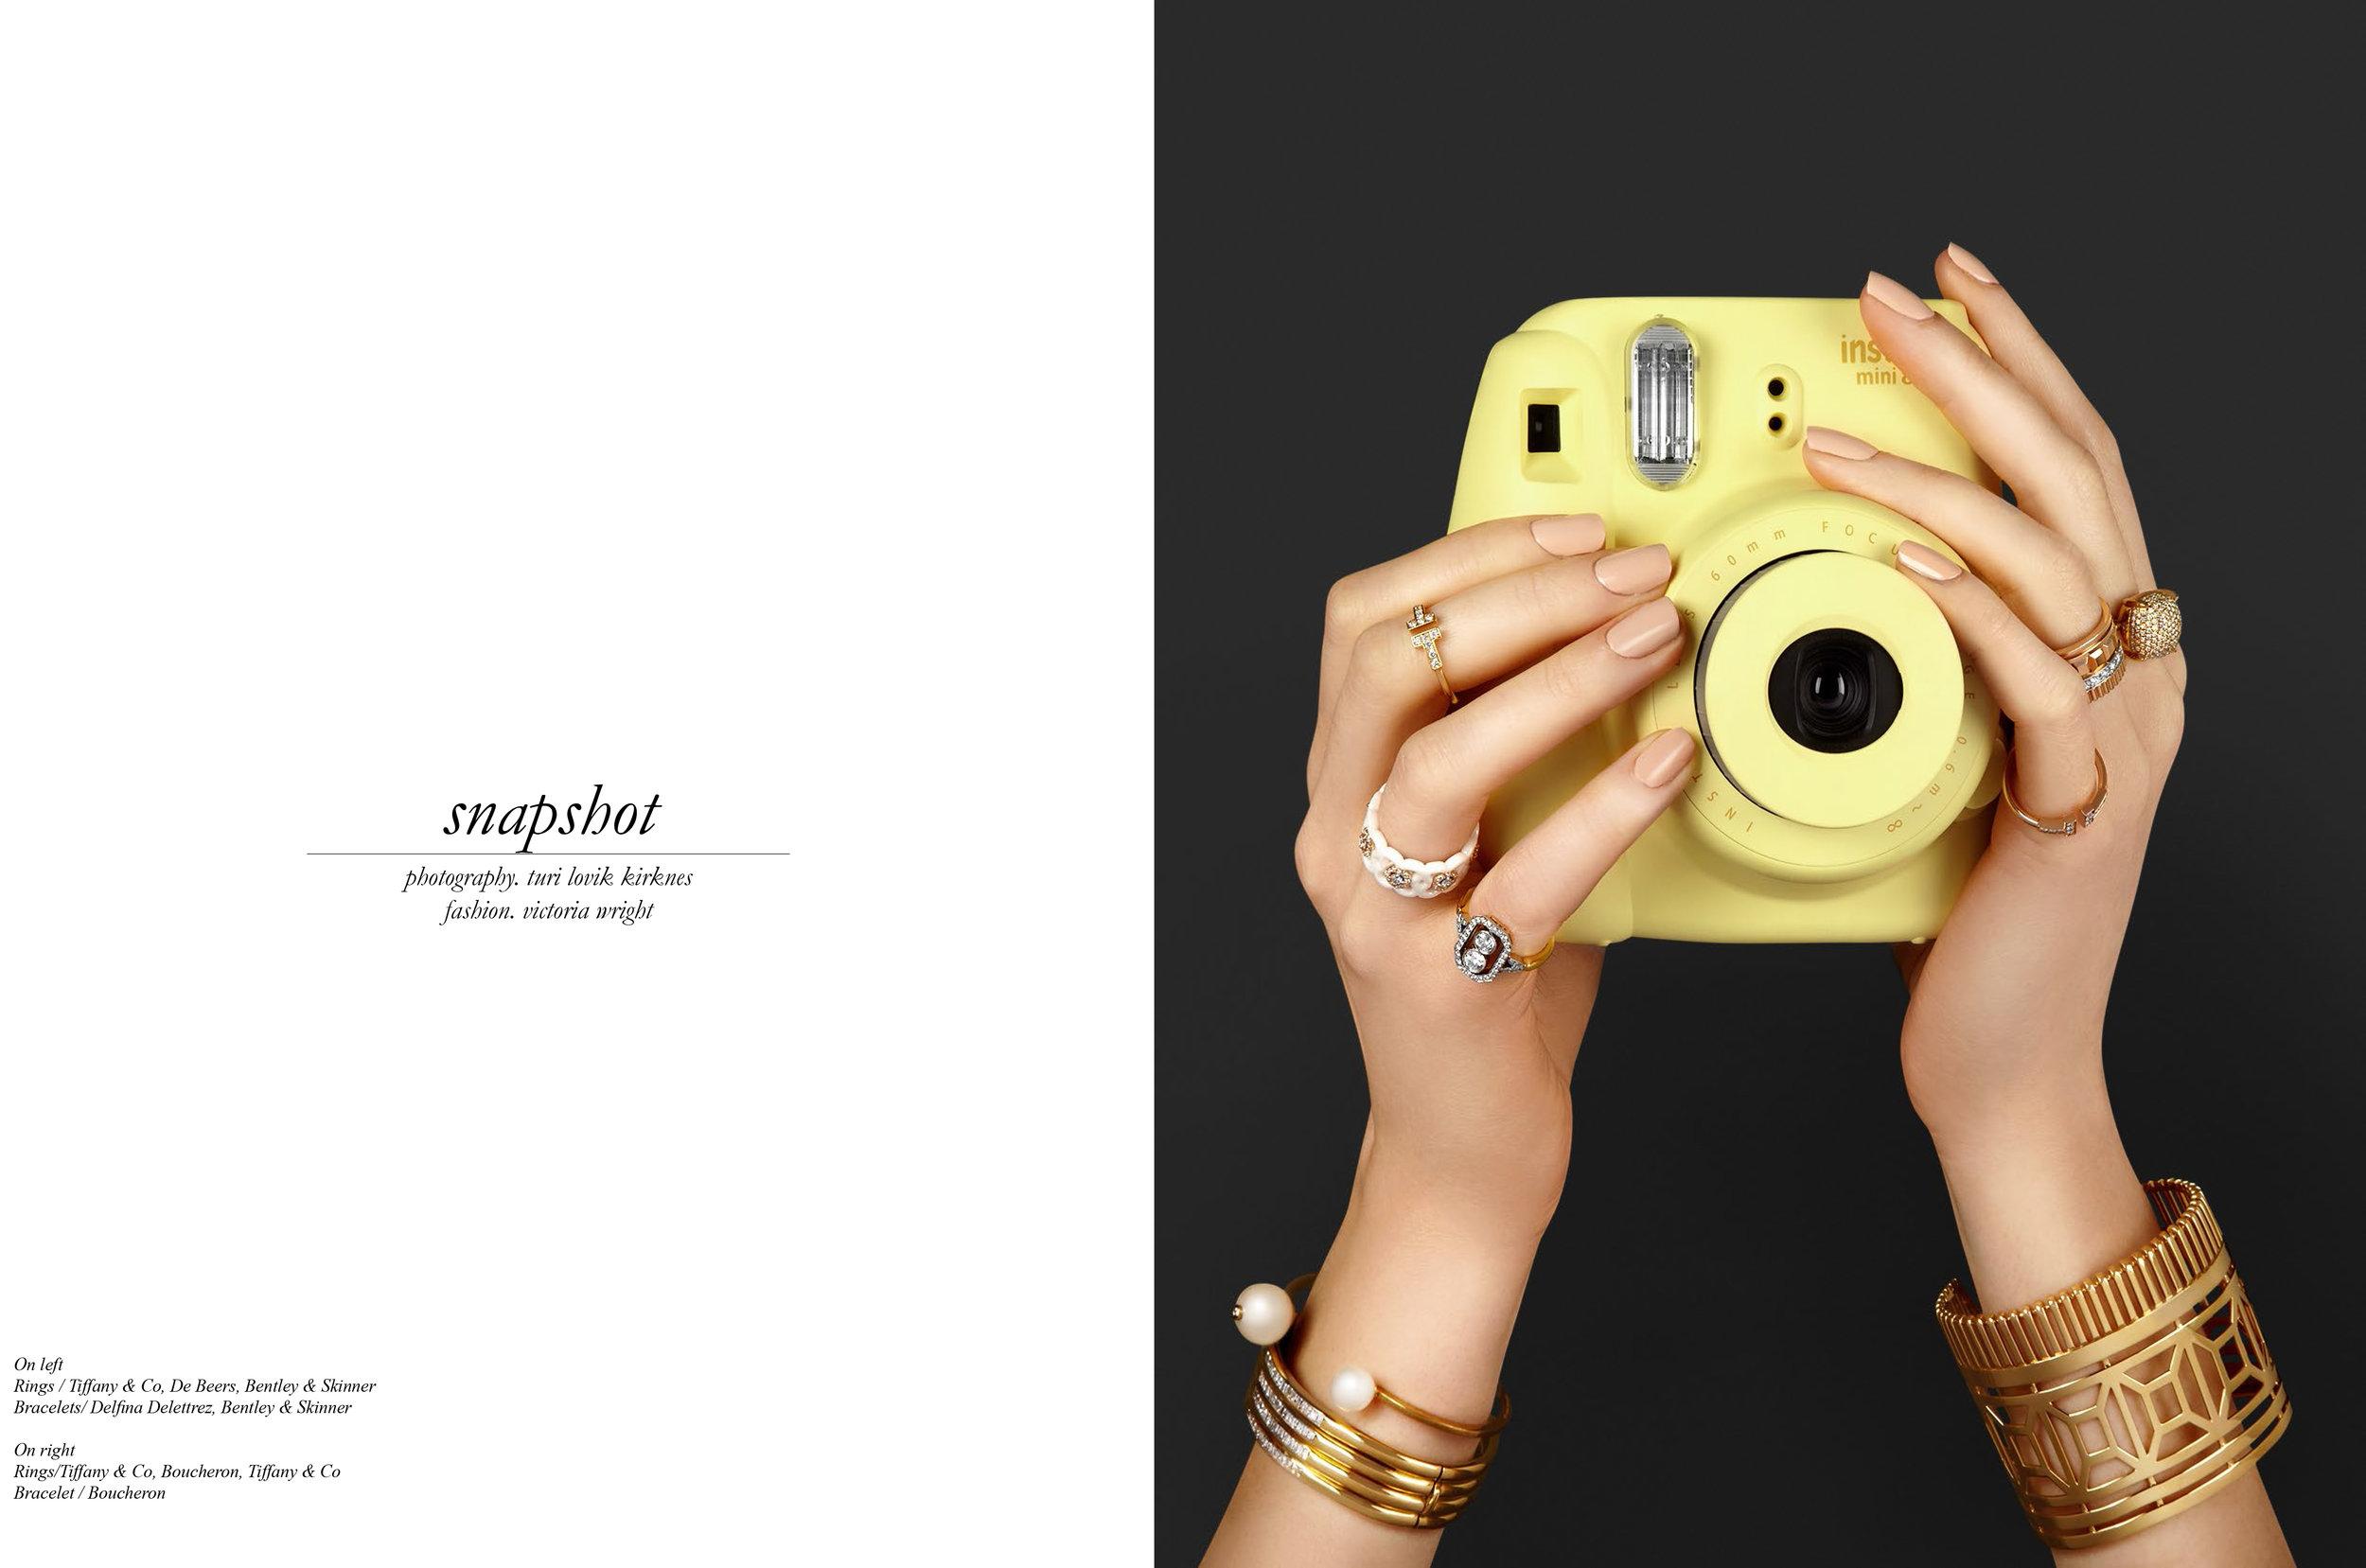 Schon_Magazine_snapshot-1.jpg